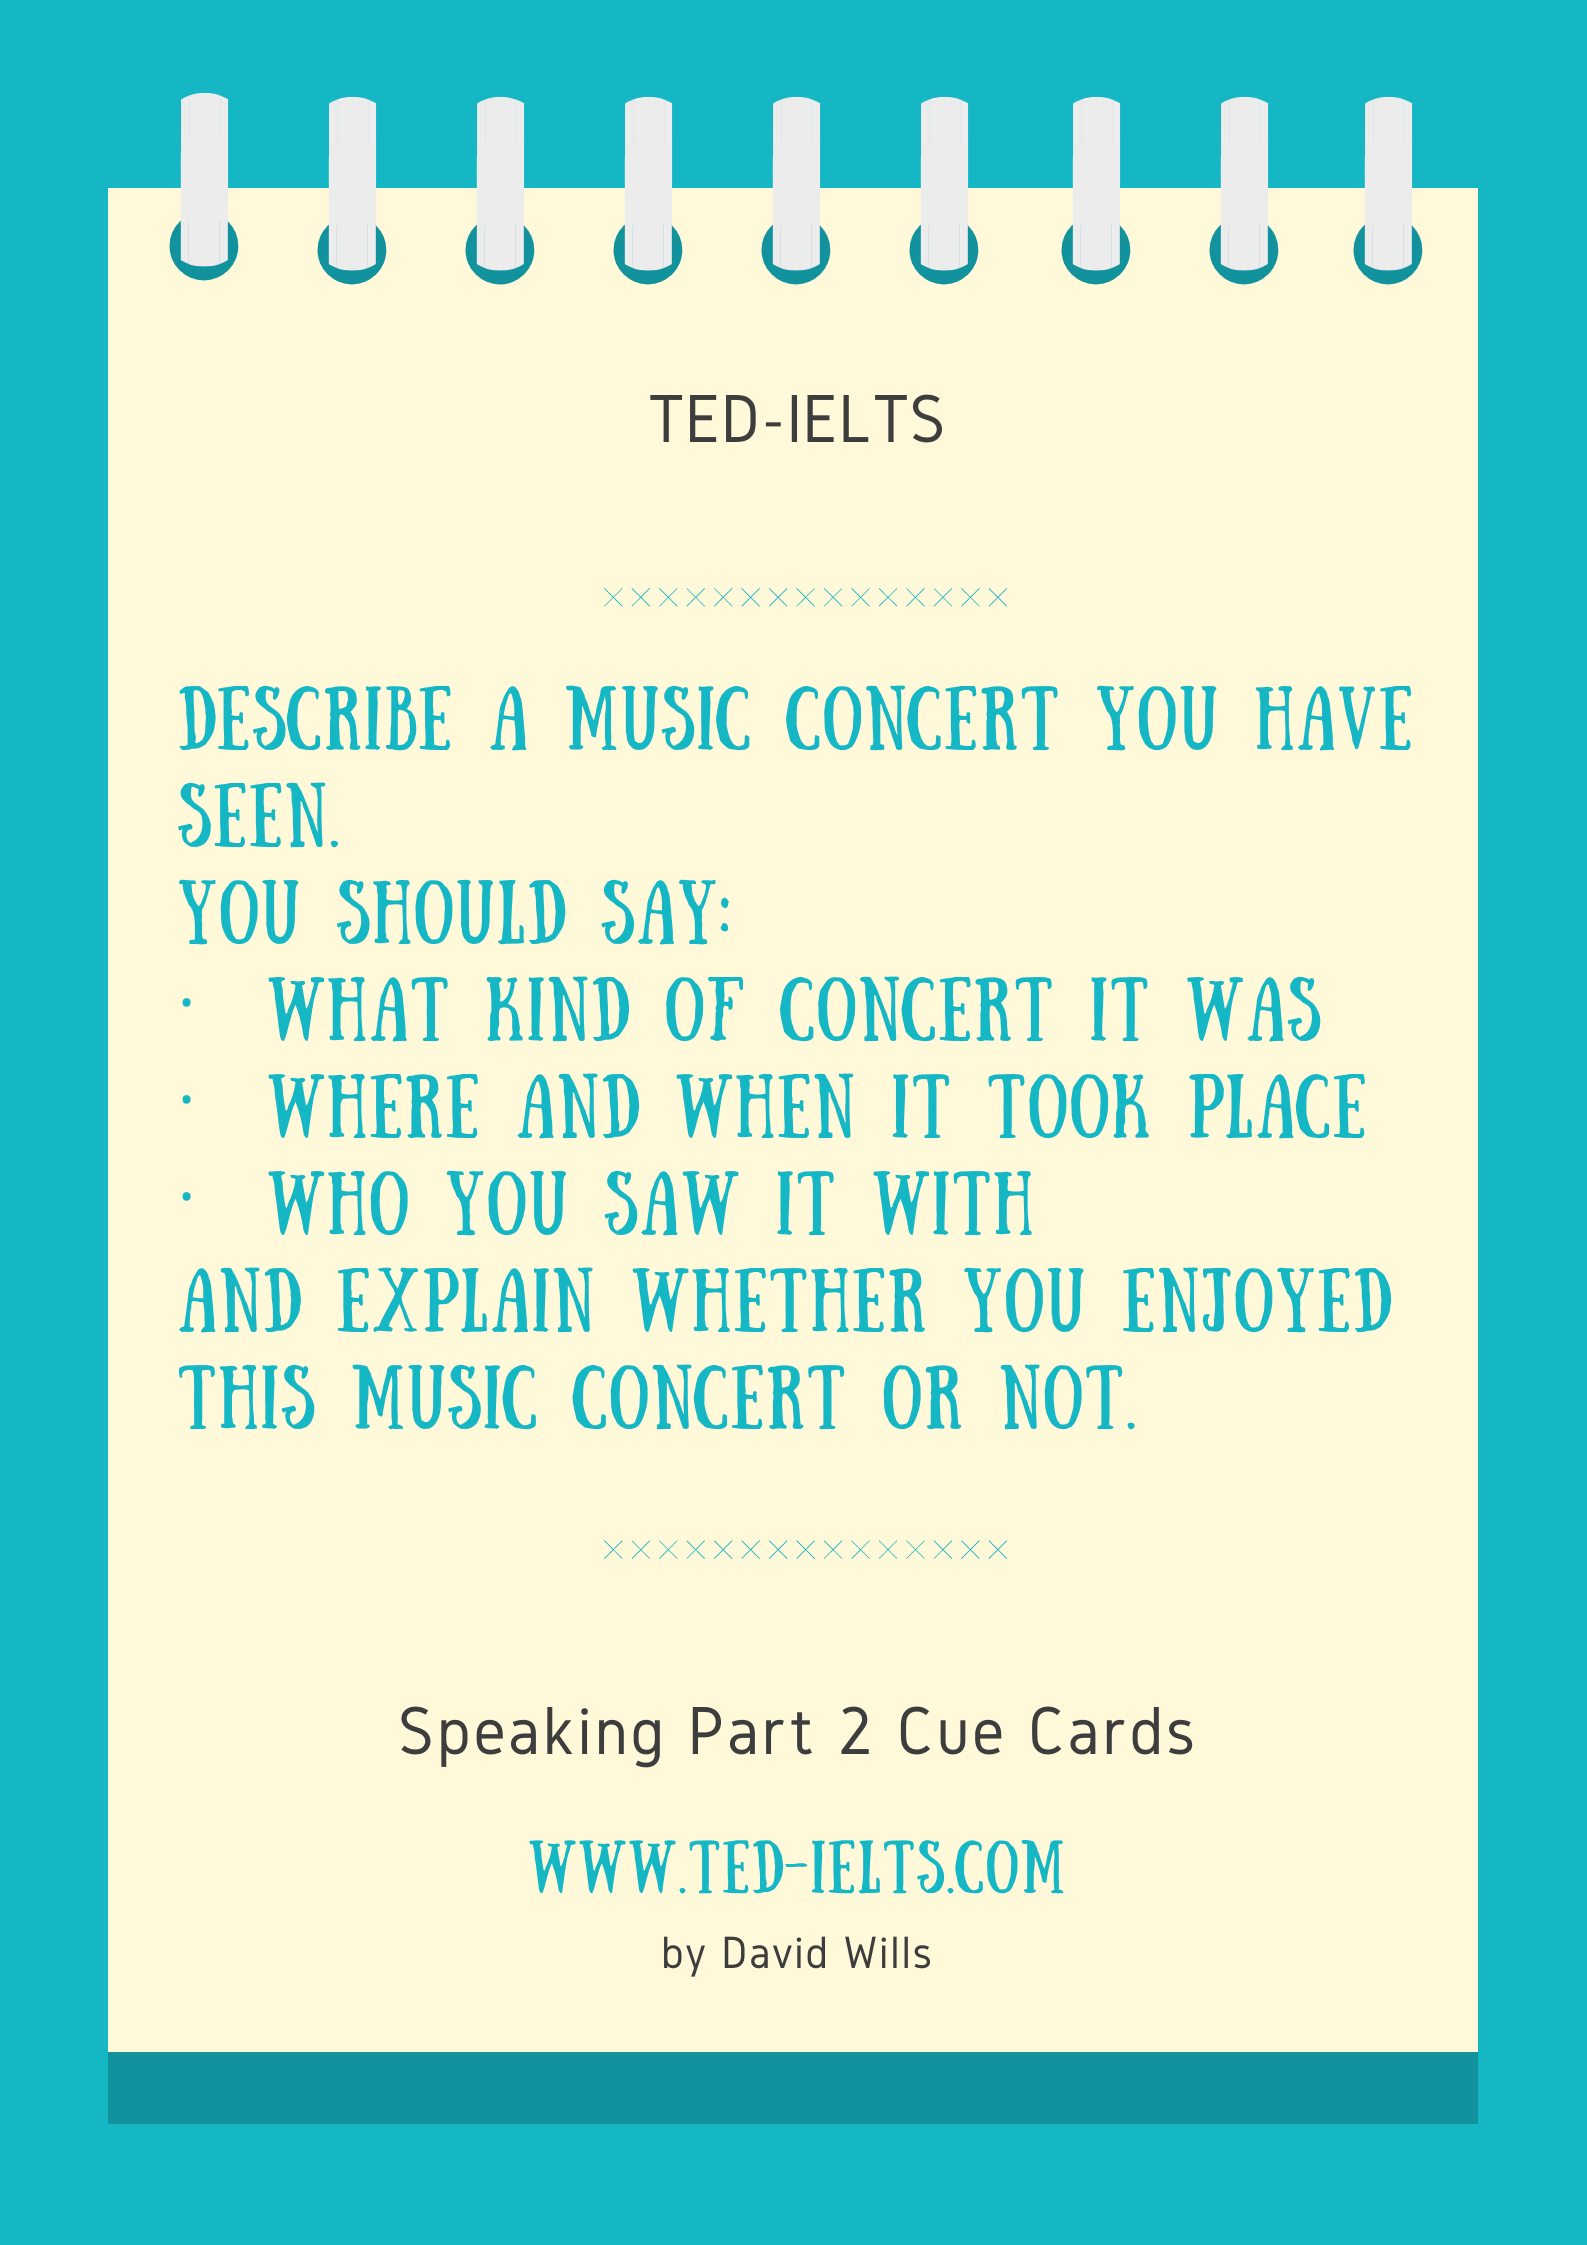 describe a concert for ielts